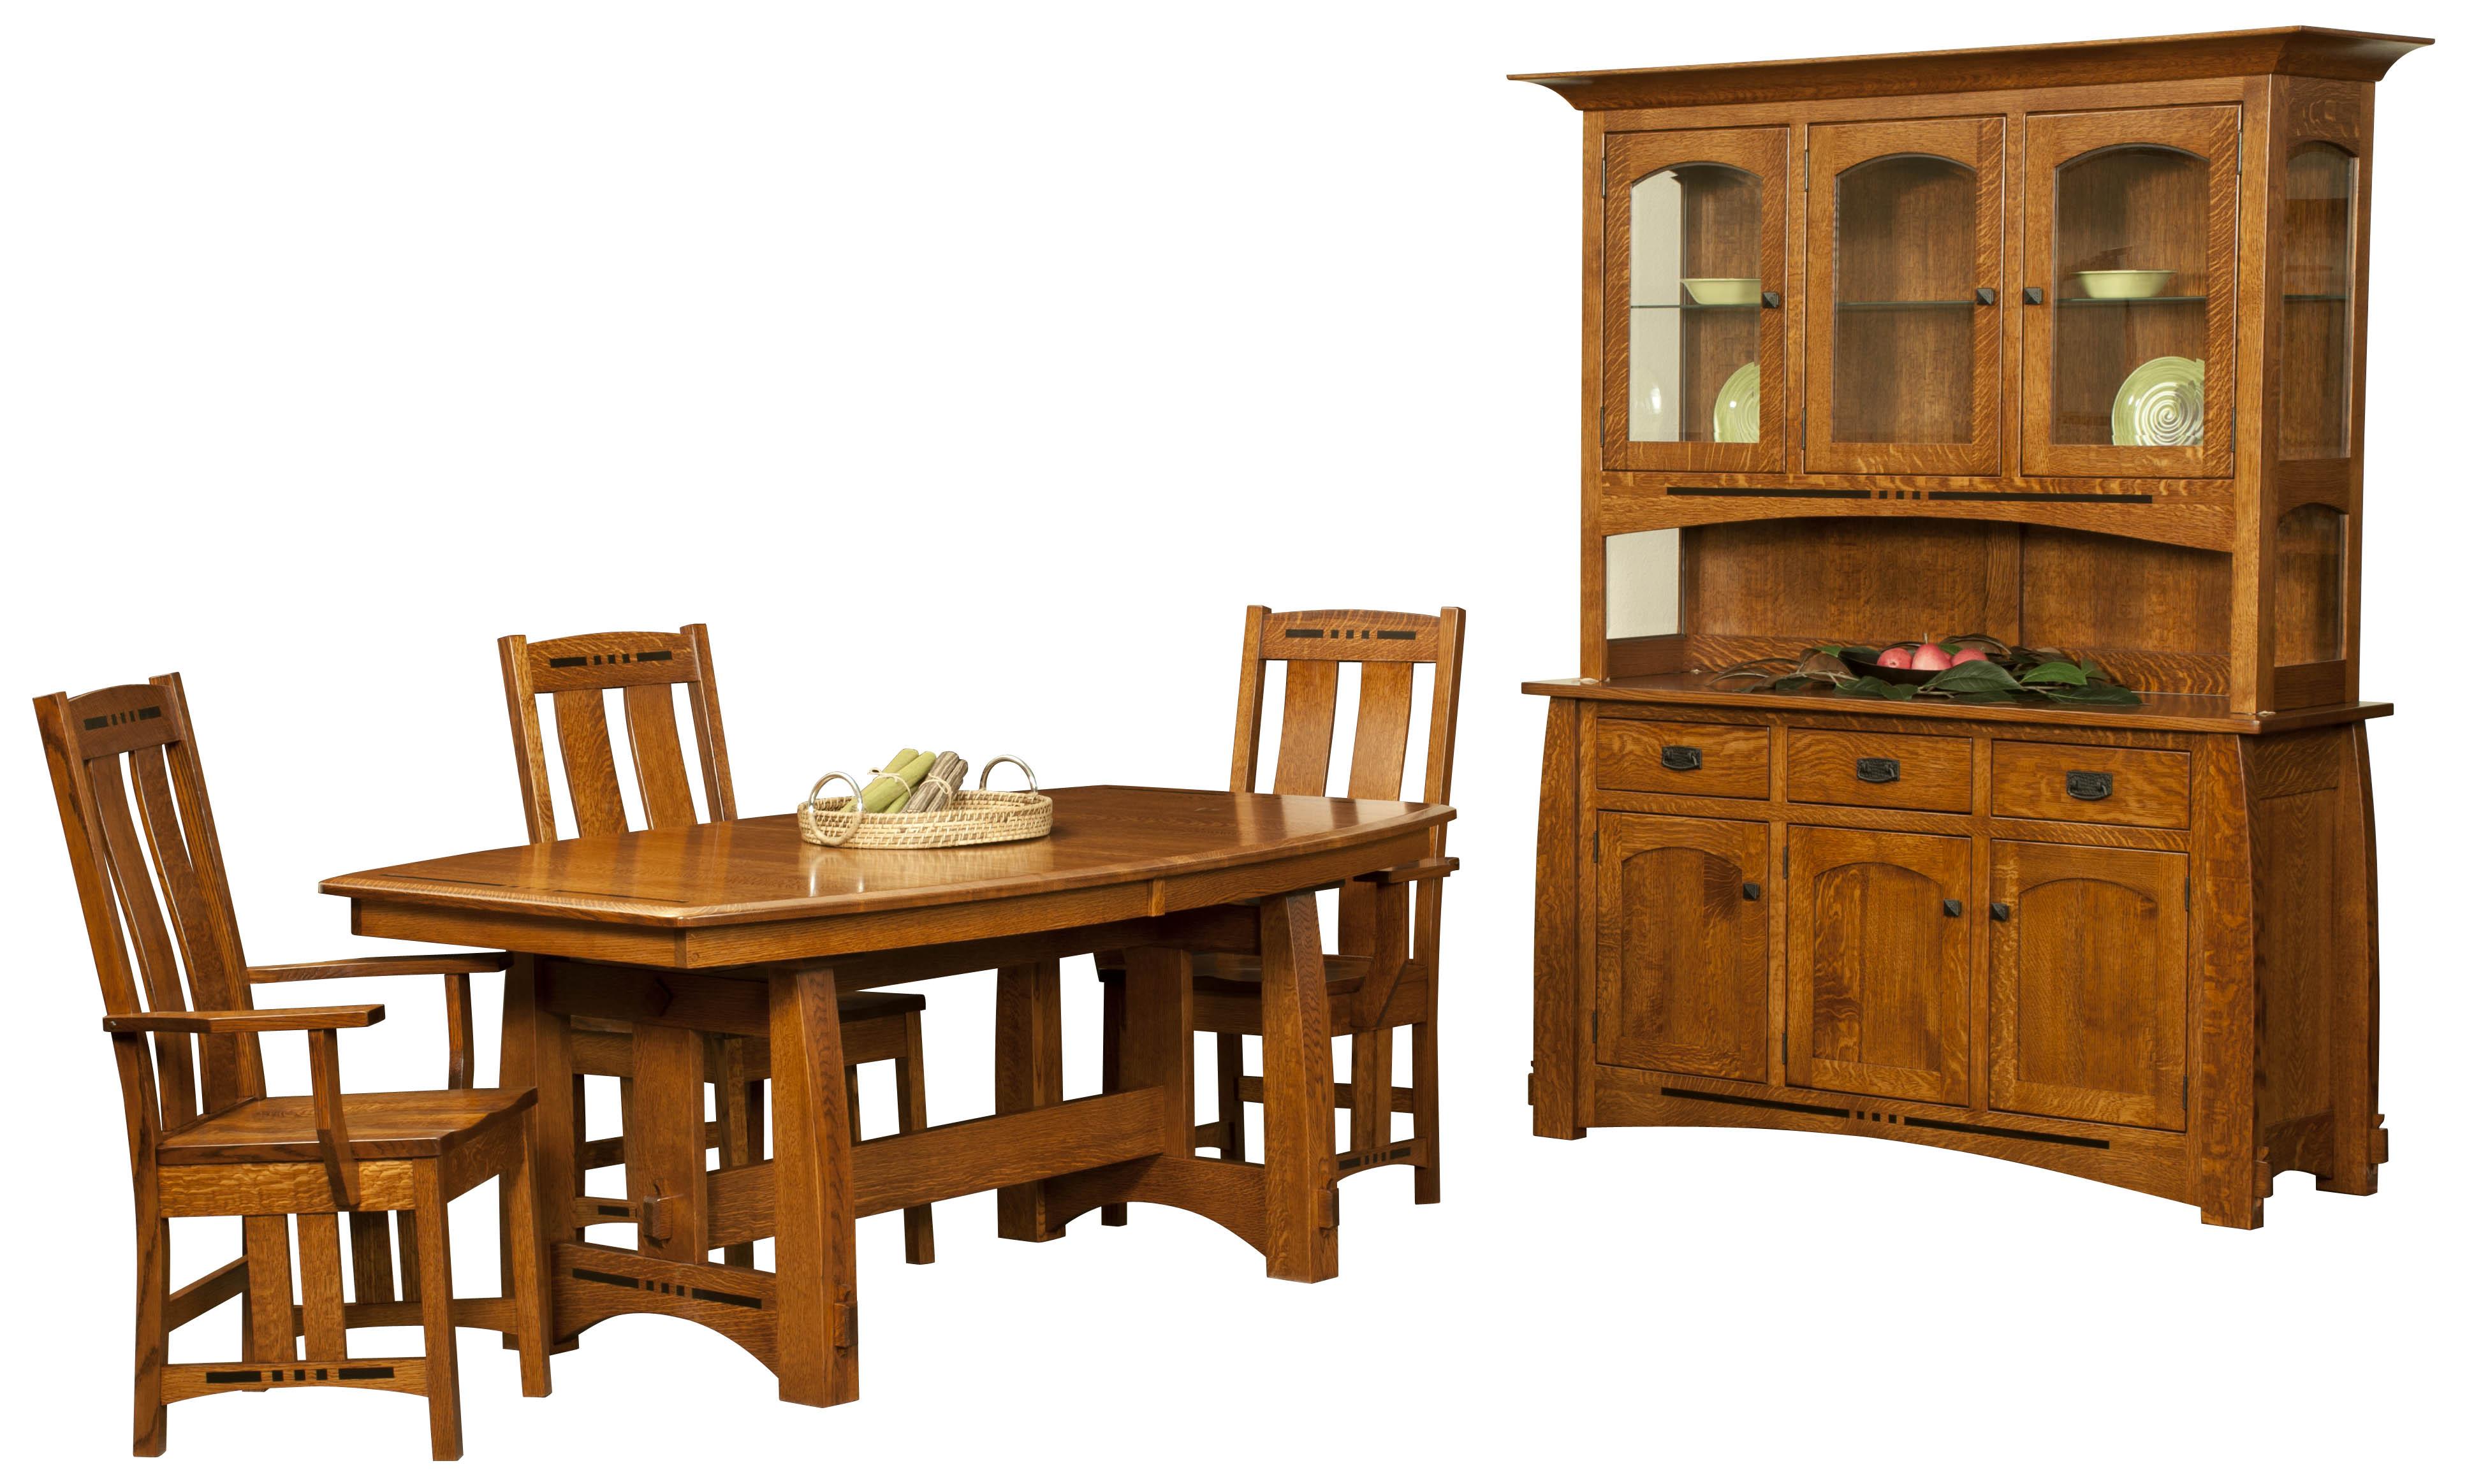 High Resolution Wallpaper   Furniture 3880x2328 px